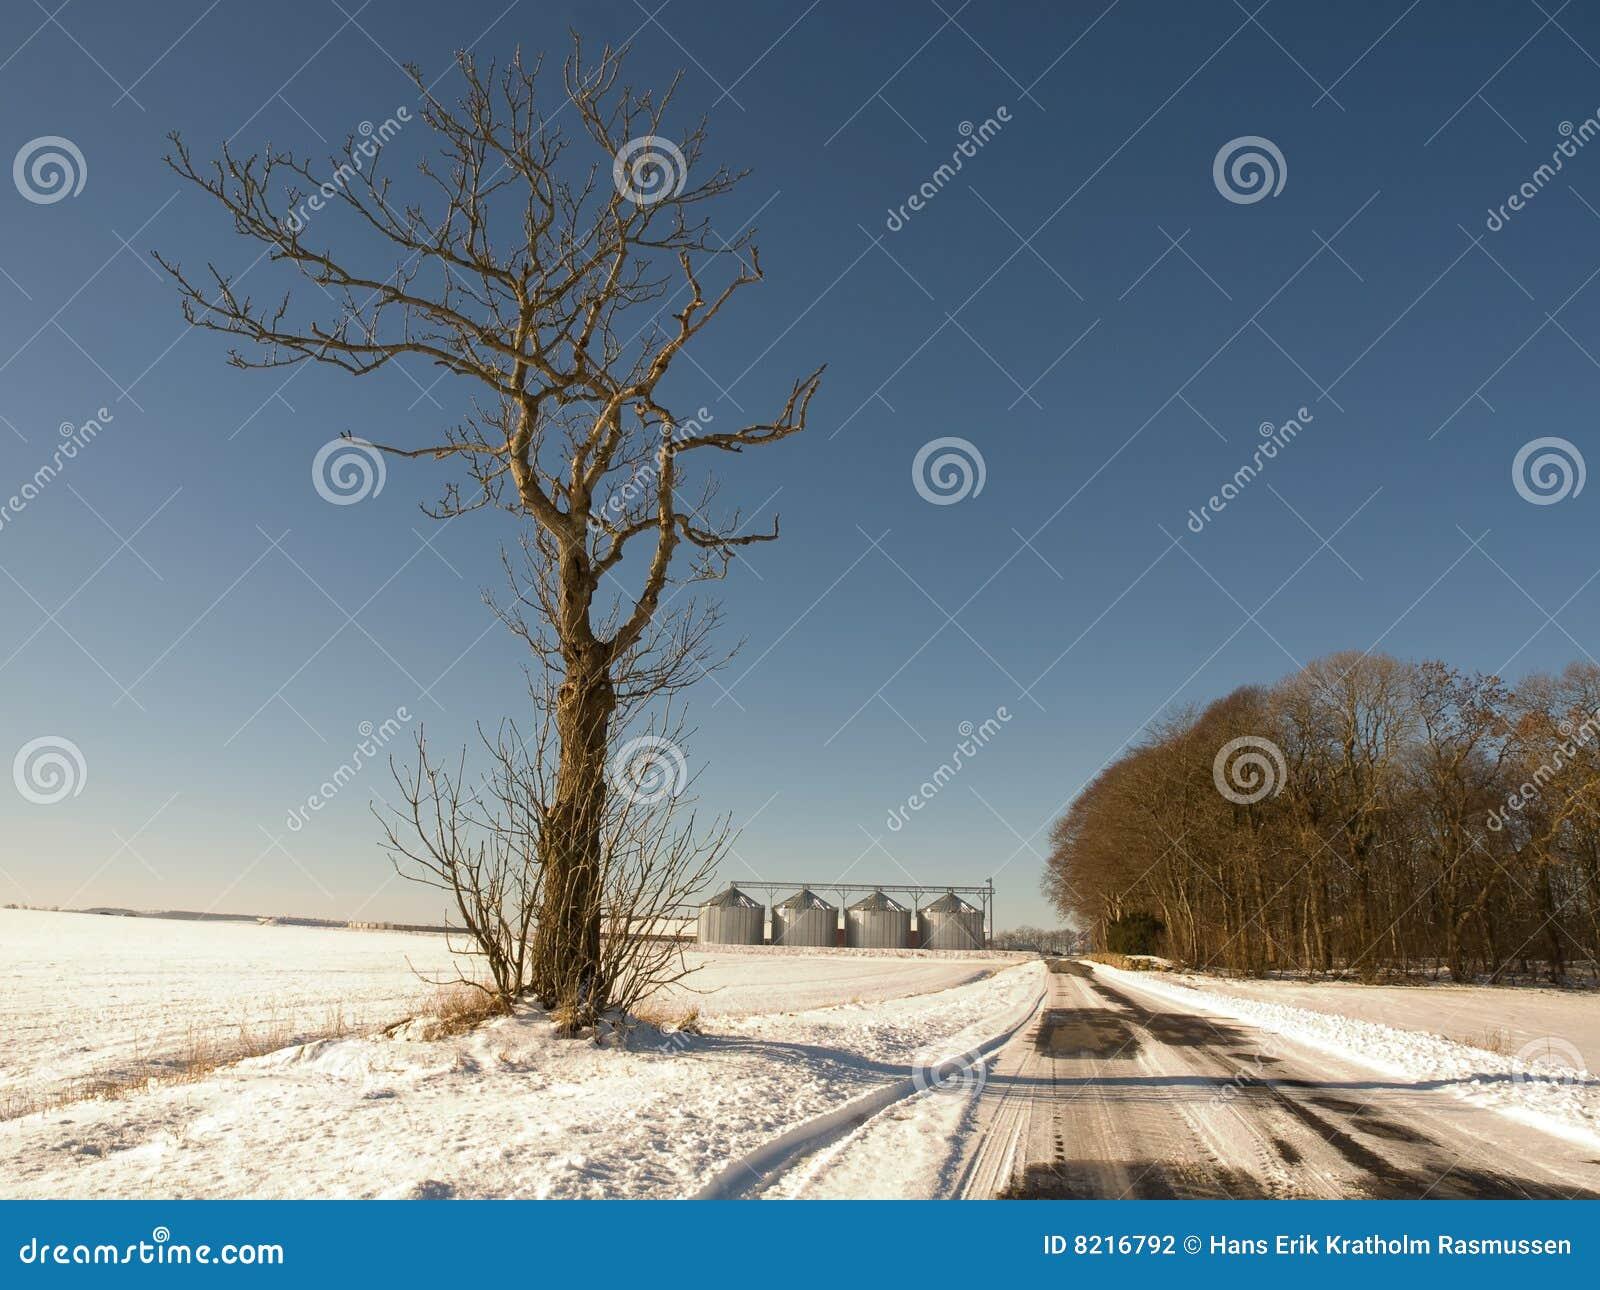 Winter road and farm